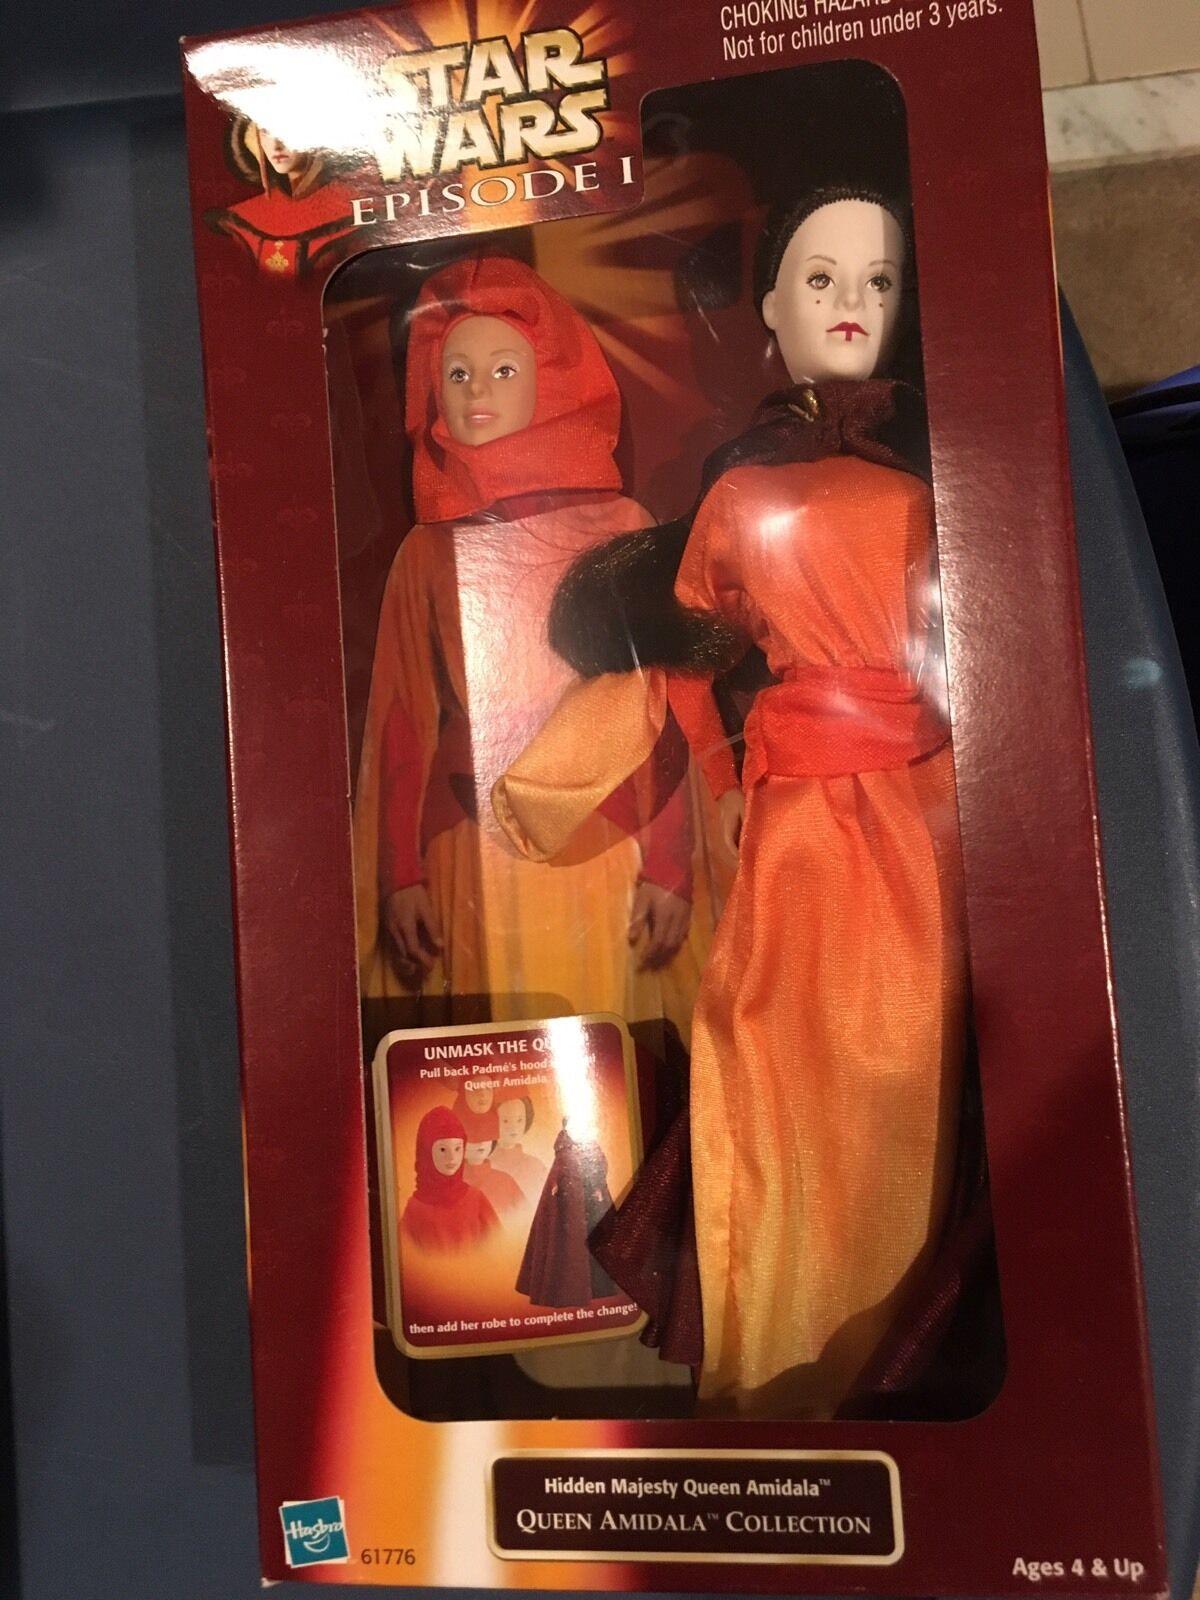 Star Wars Phantom Uomoace Queen Amidala dolls - Lot of 2